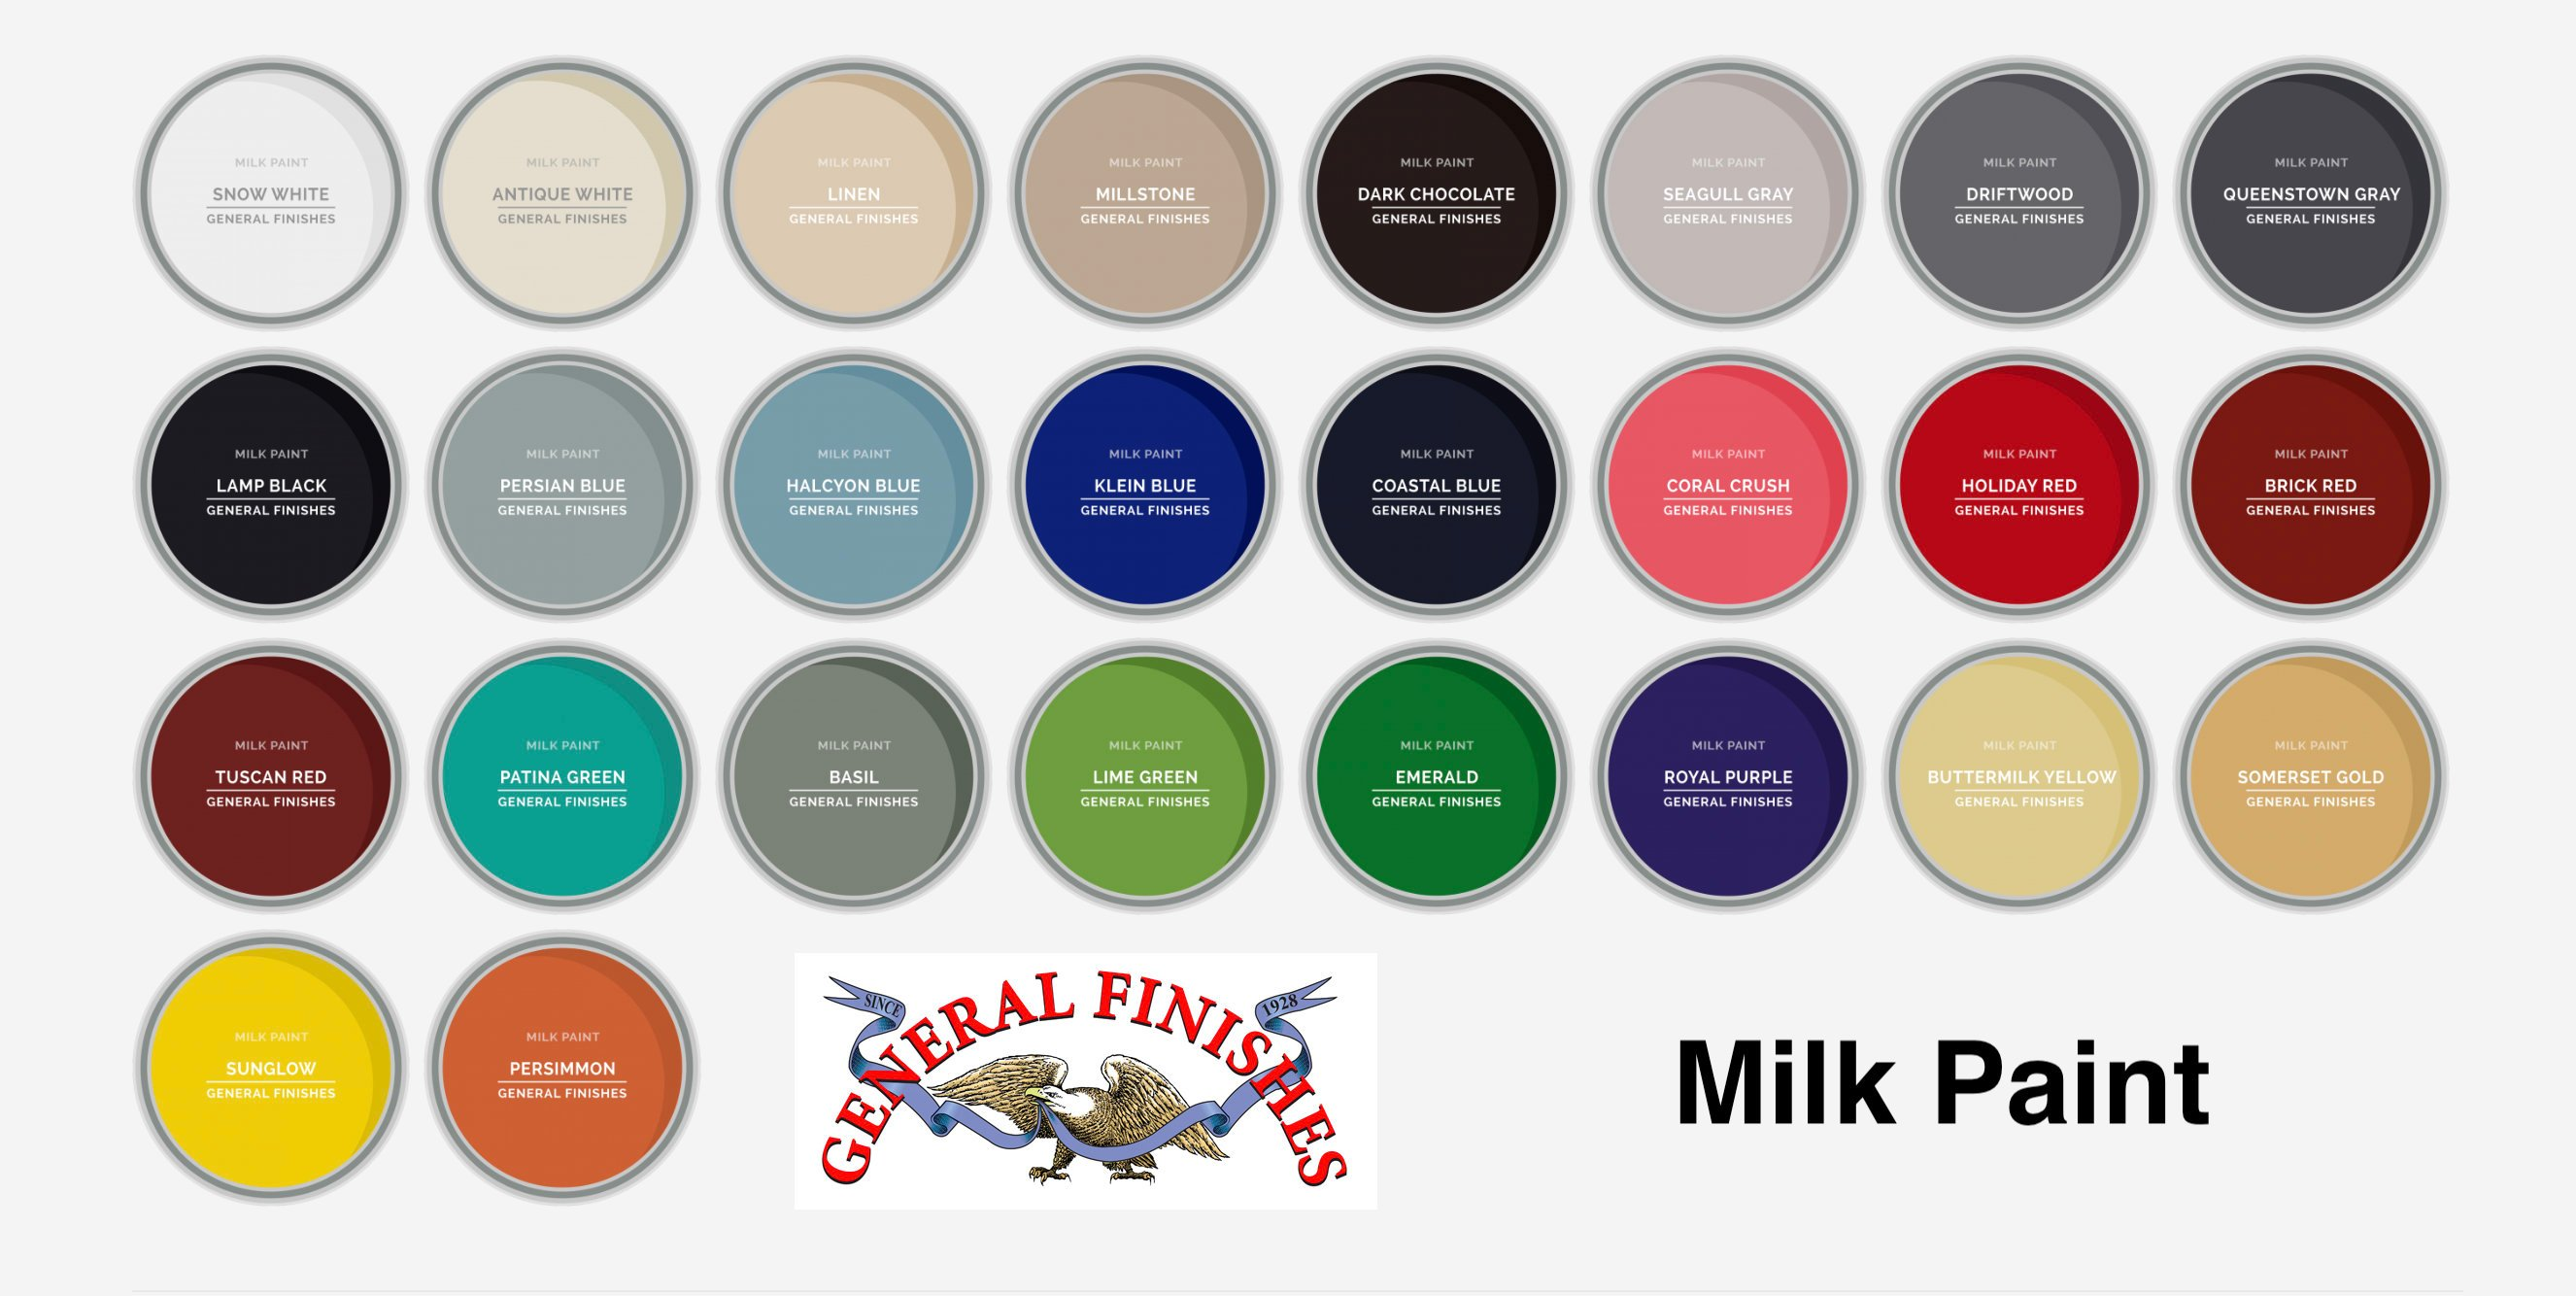 General Finishes Milk Paint Seagull Gray Quart